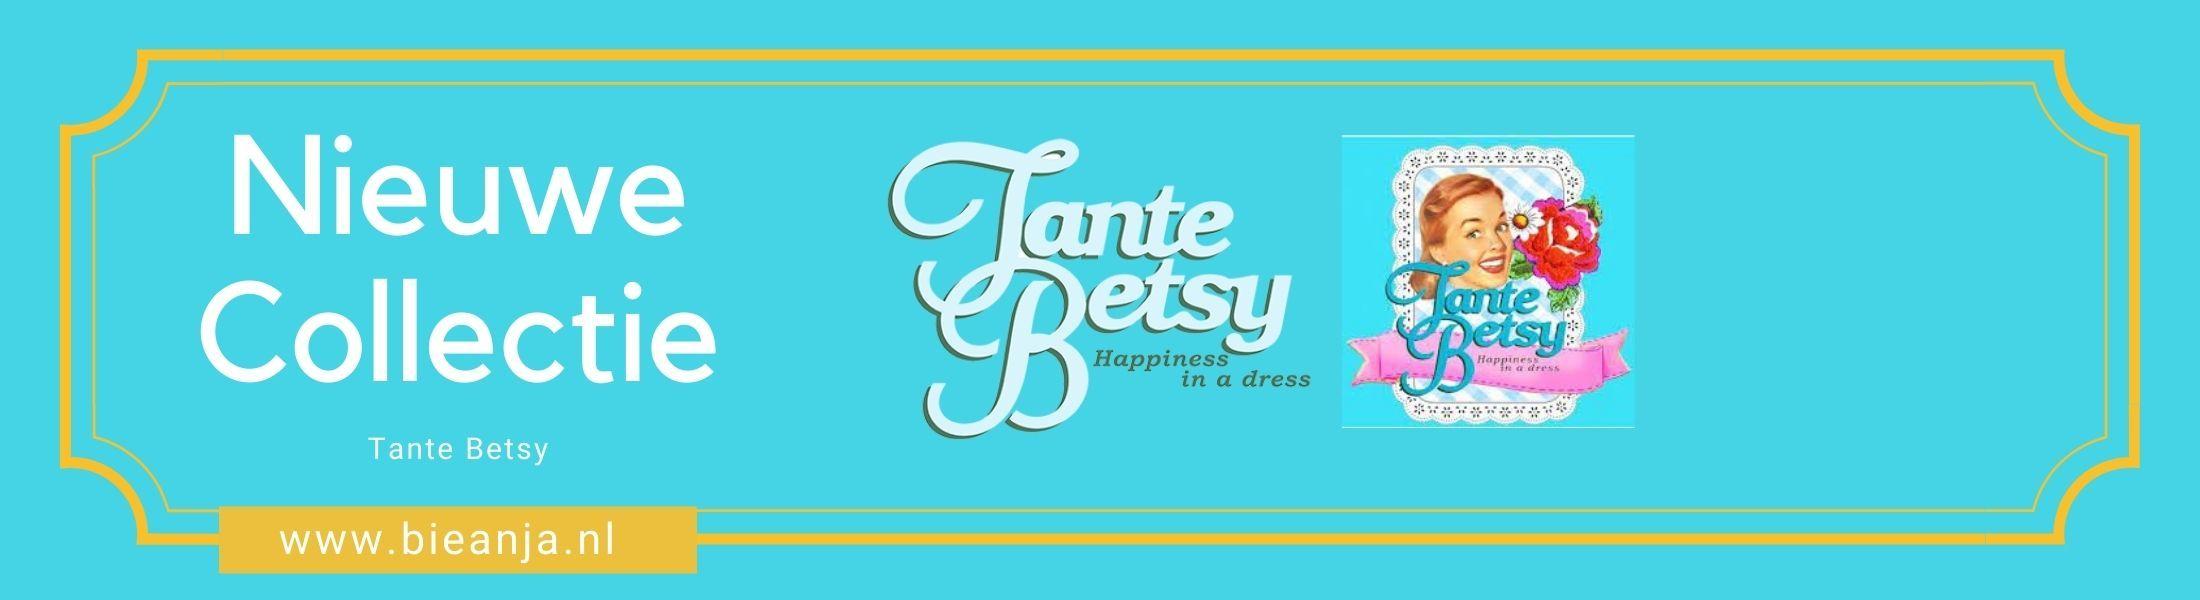 Tante  Betsy nieuwe collectie